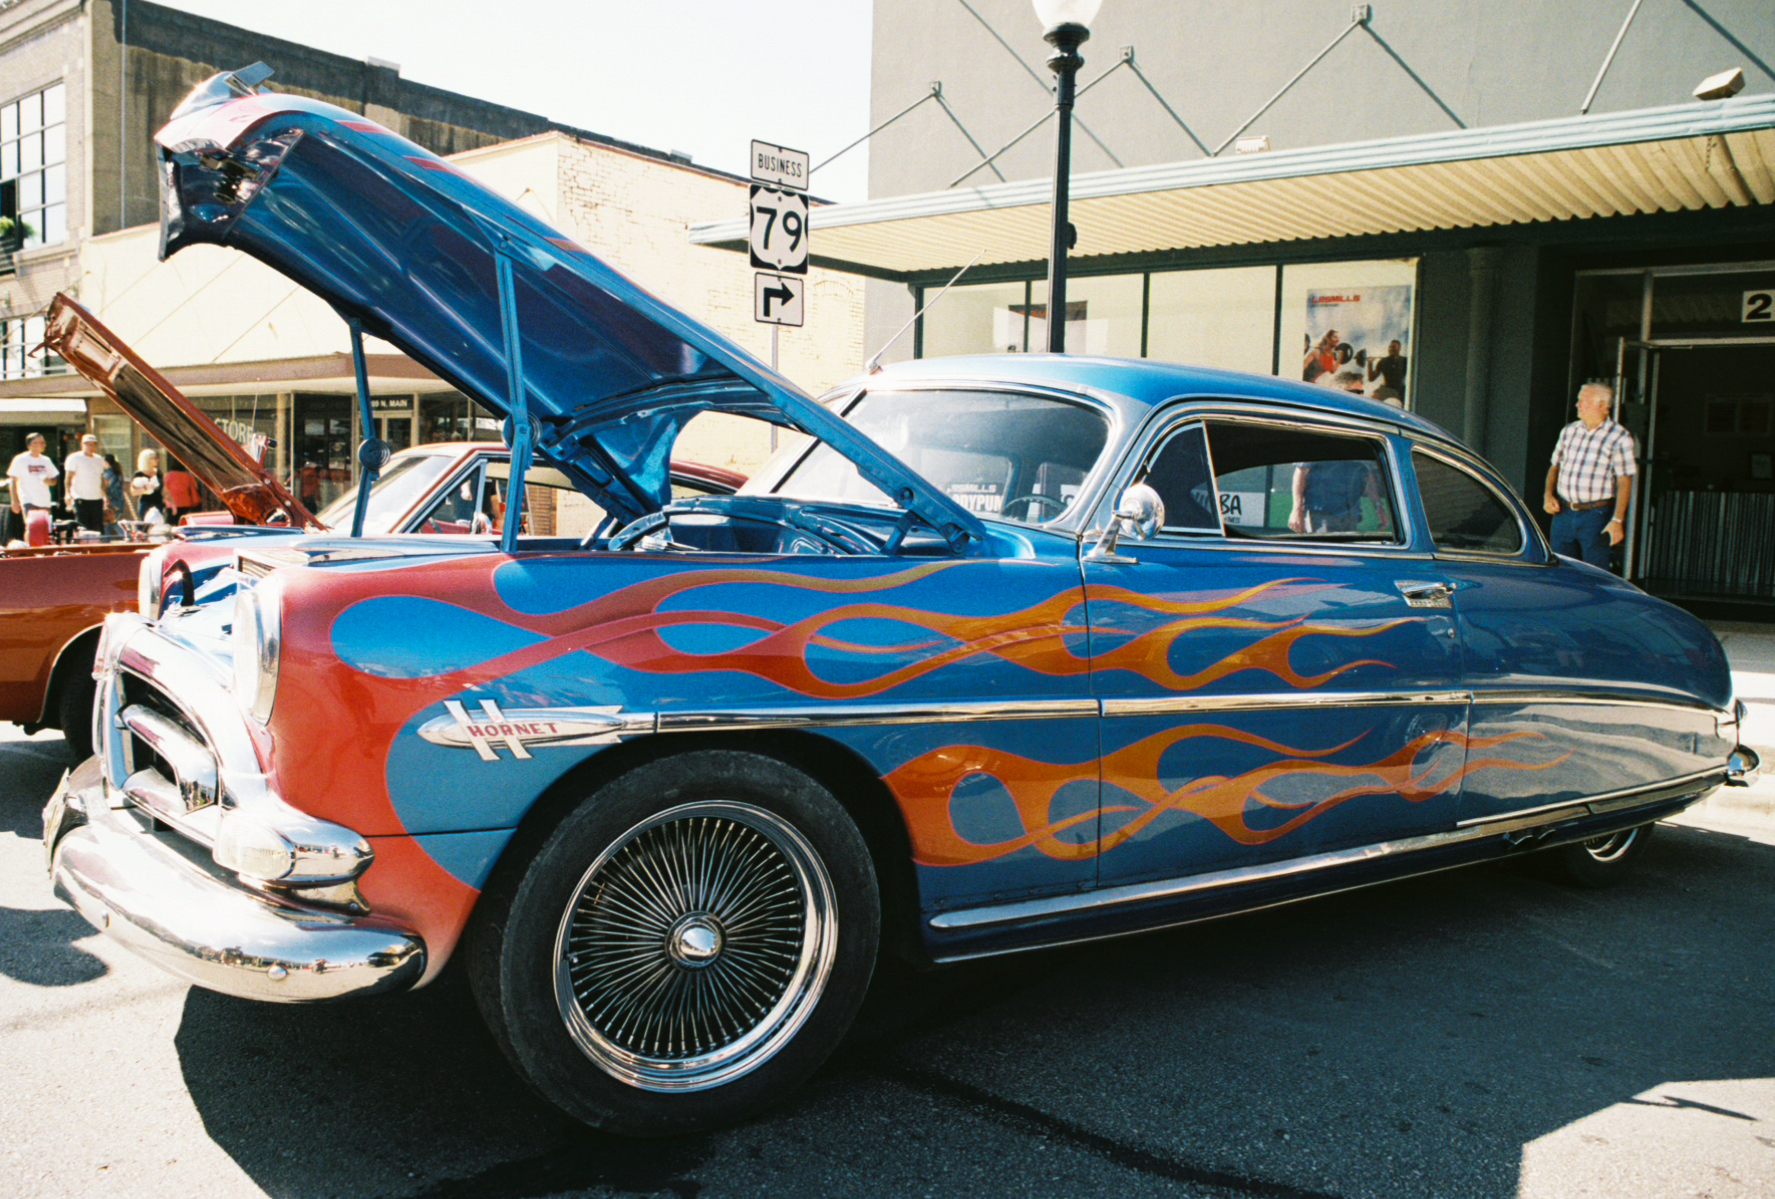 taylor-main-street-car-show-2016-8.jpg